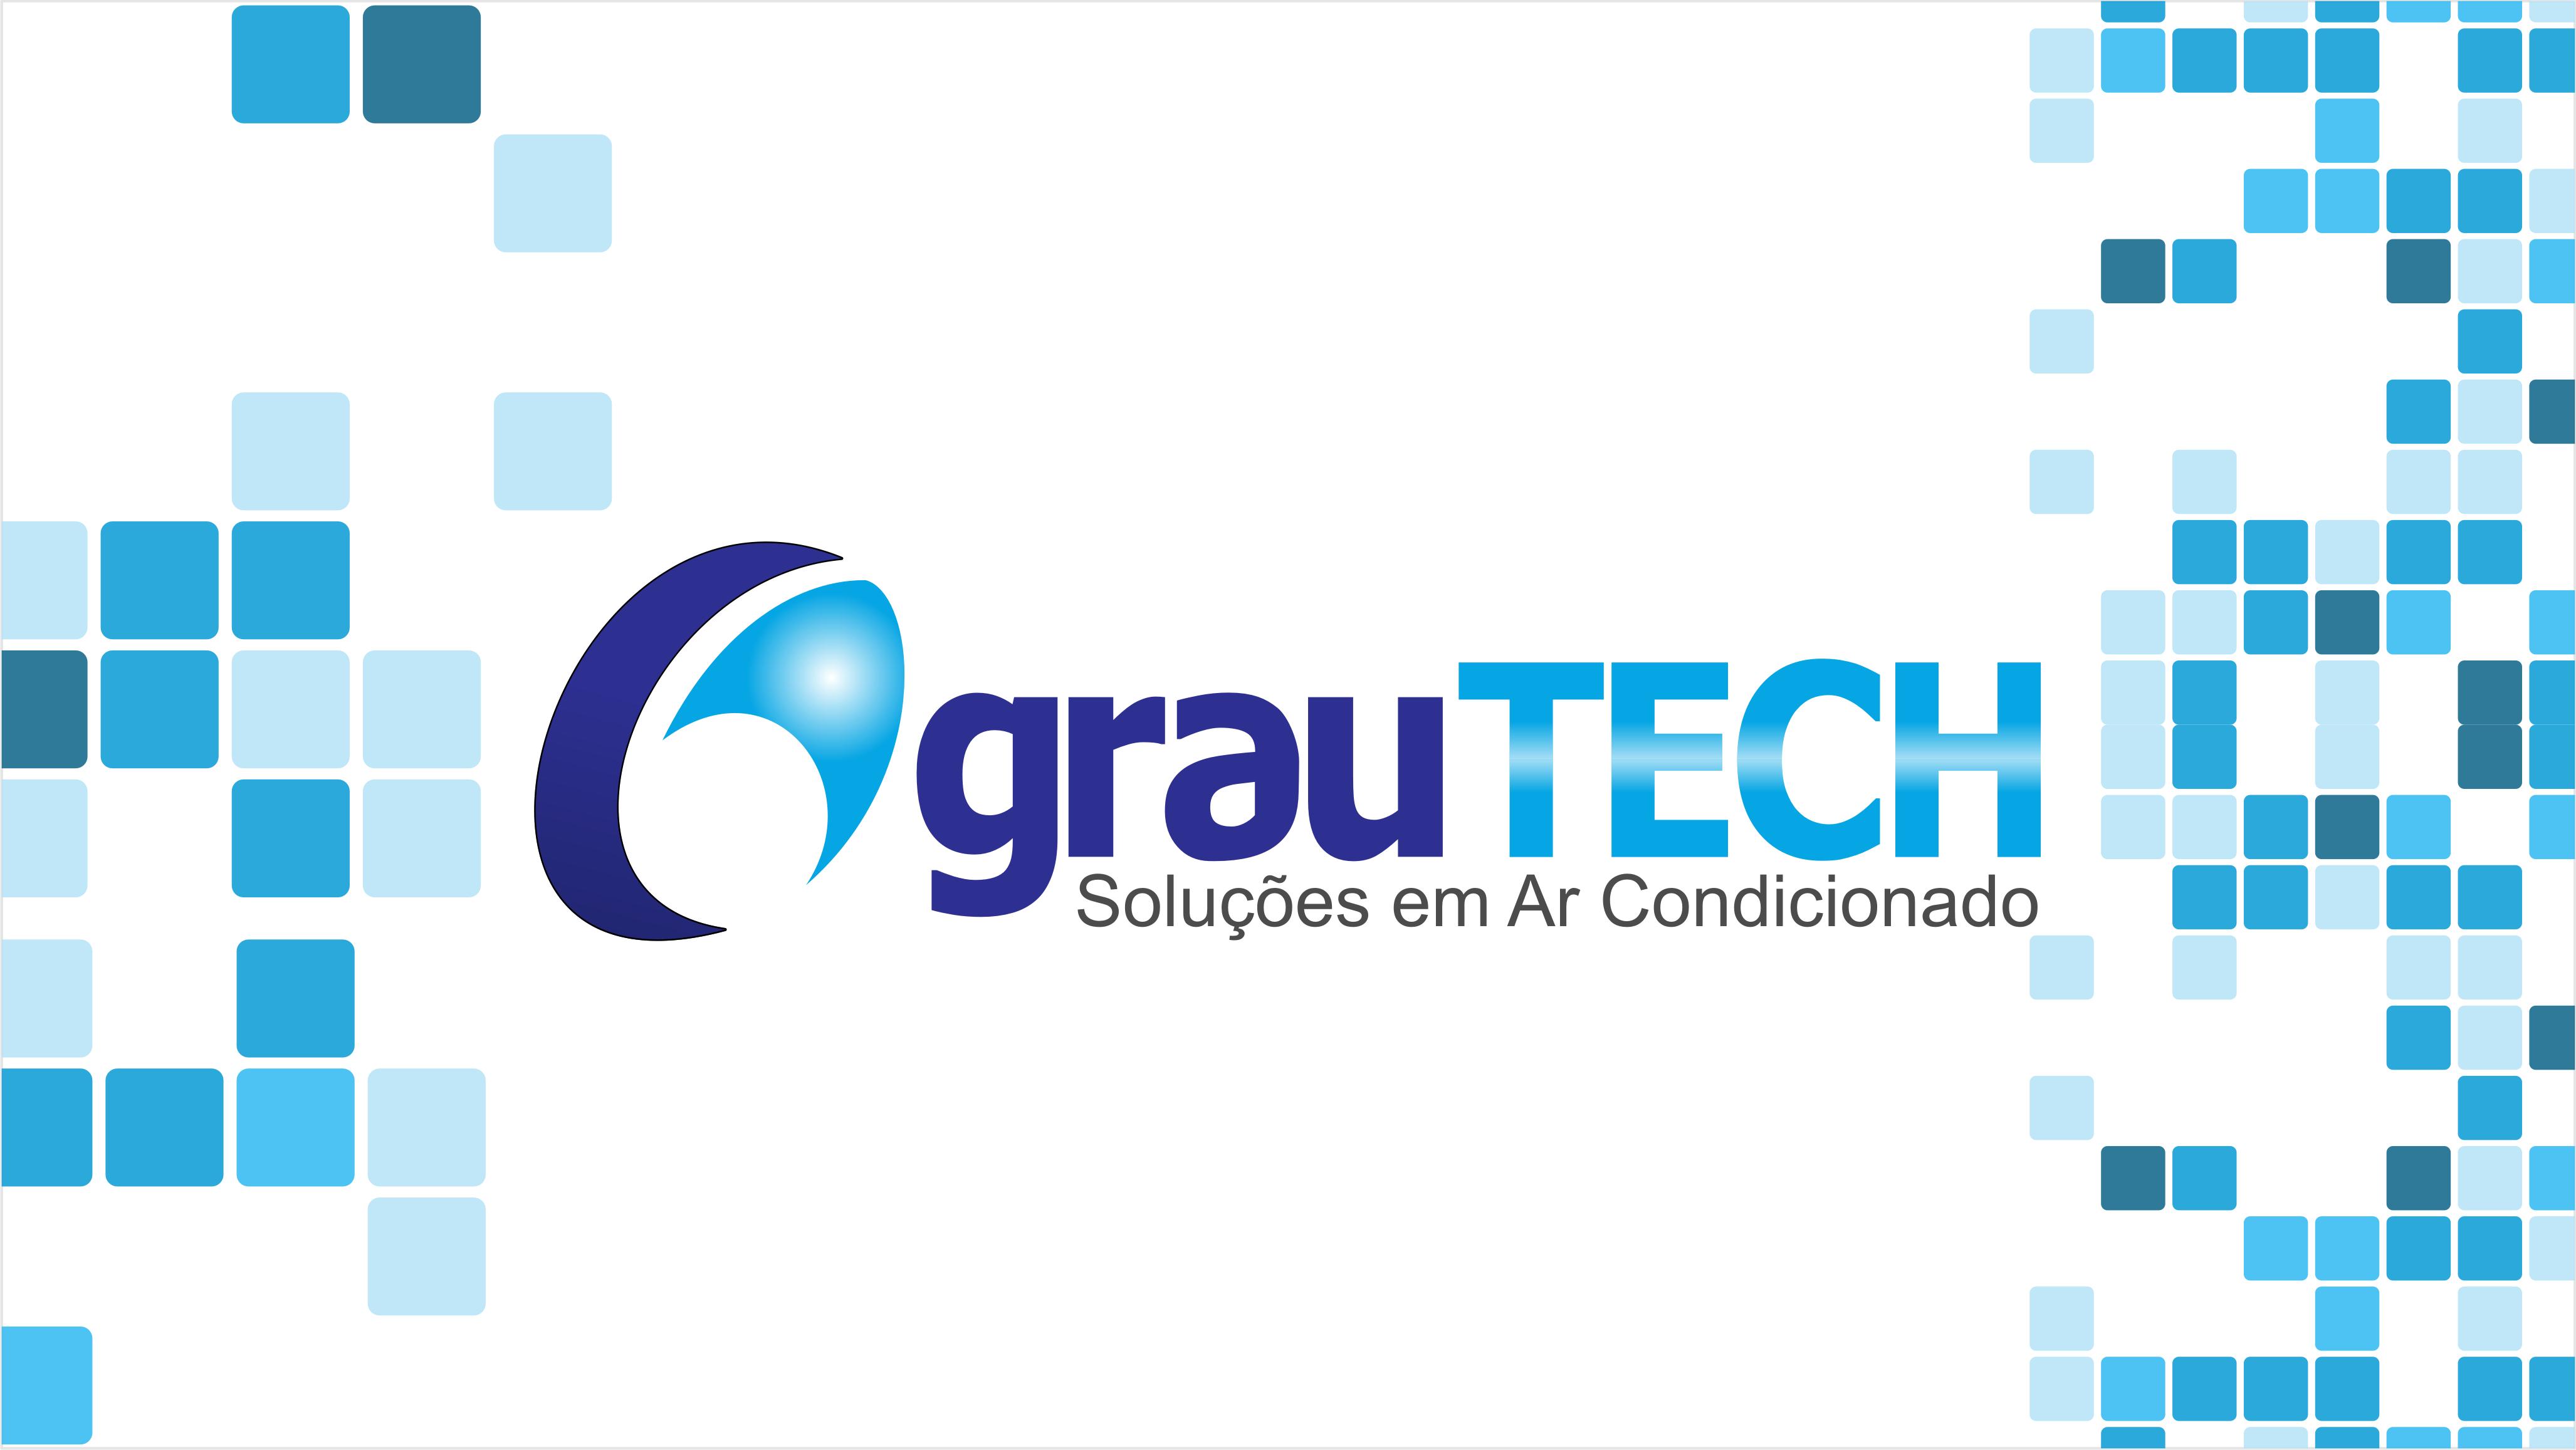 GrauTech-WEB-Comercio-Conquista-WALLPAPER